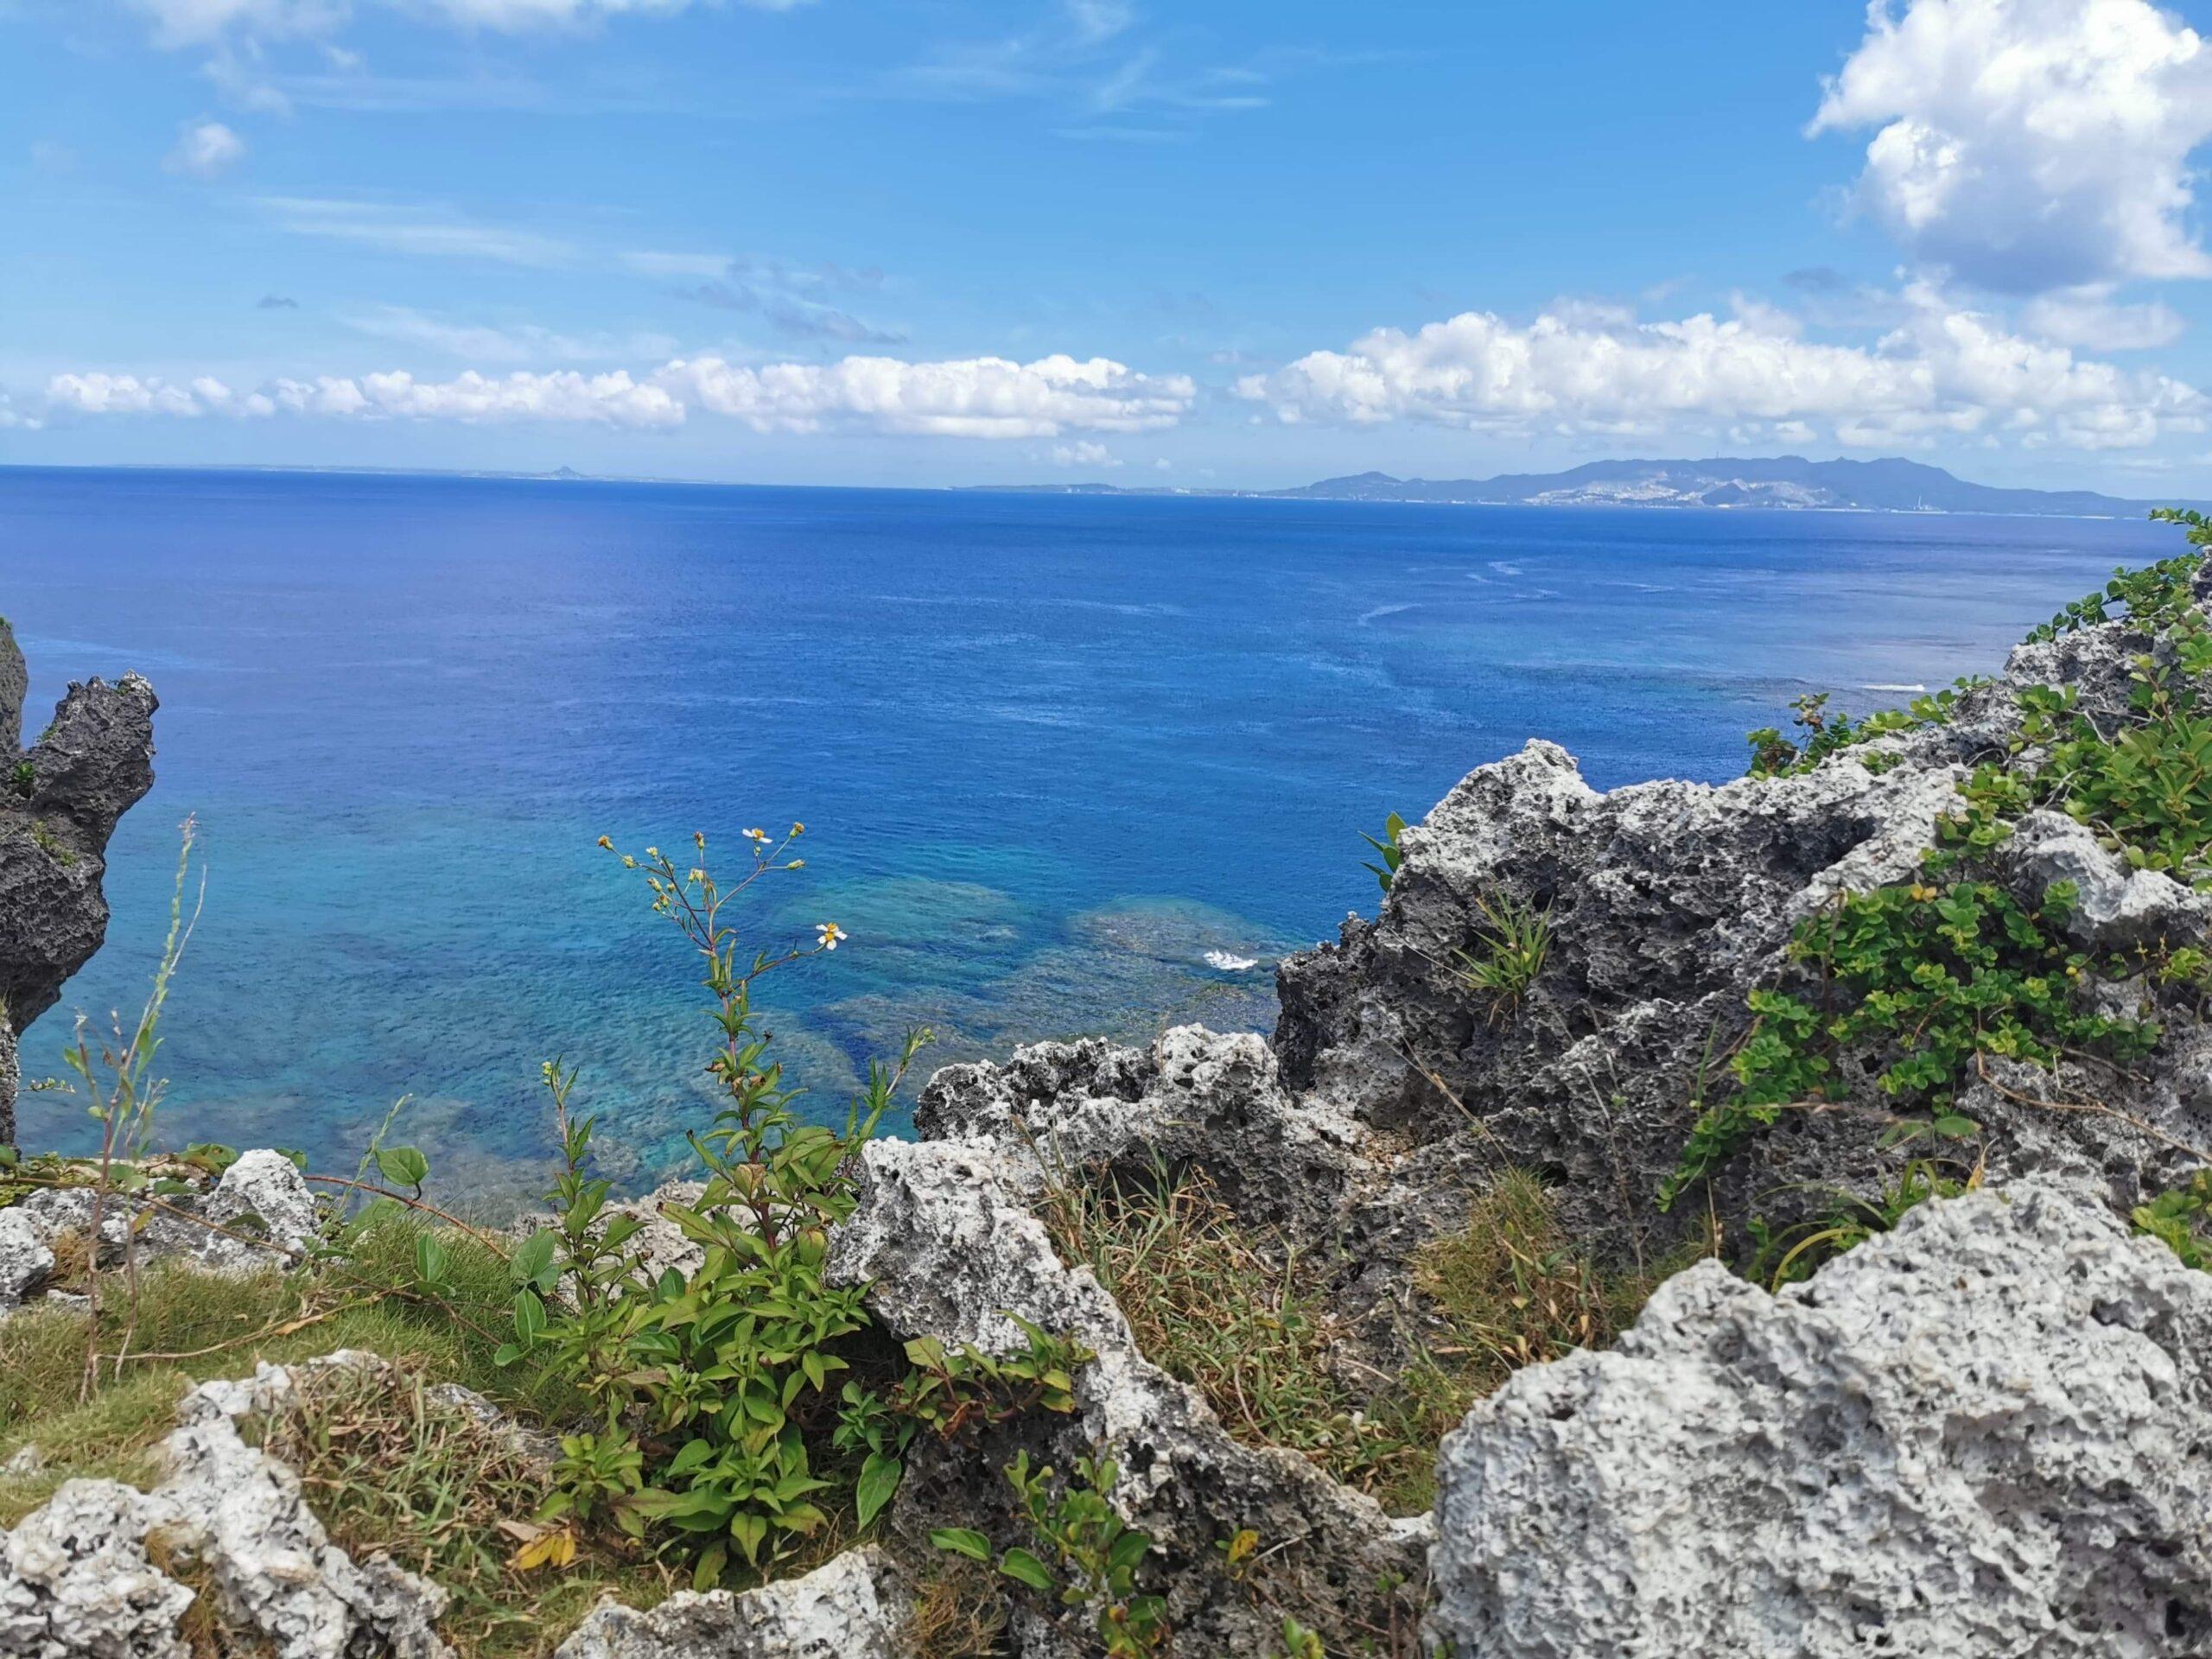 A BEAUTIFUL VIEW OF RYUKYUAN OCEAN